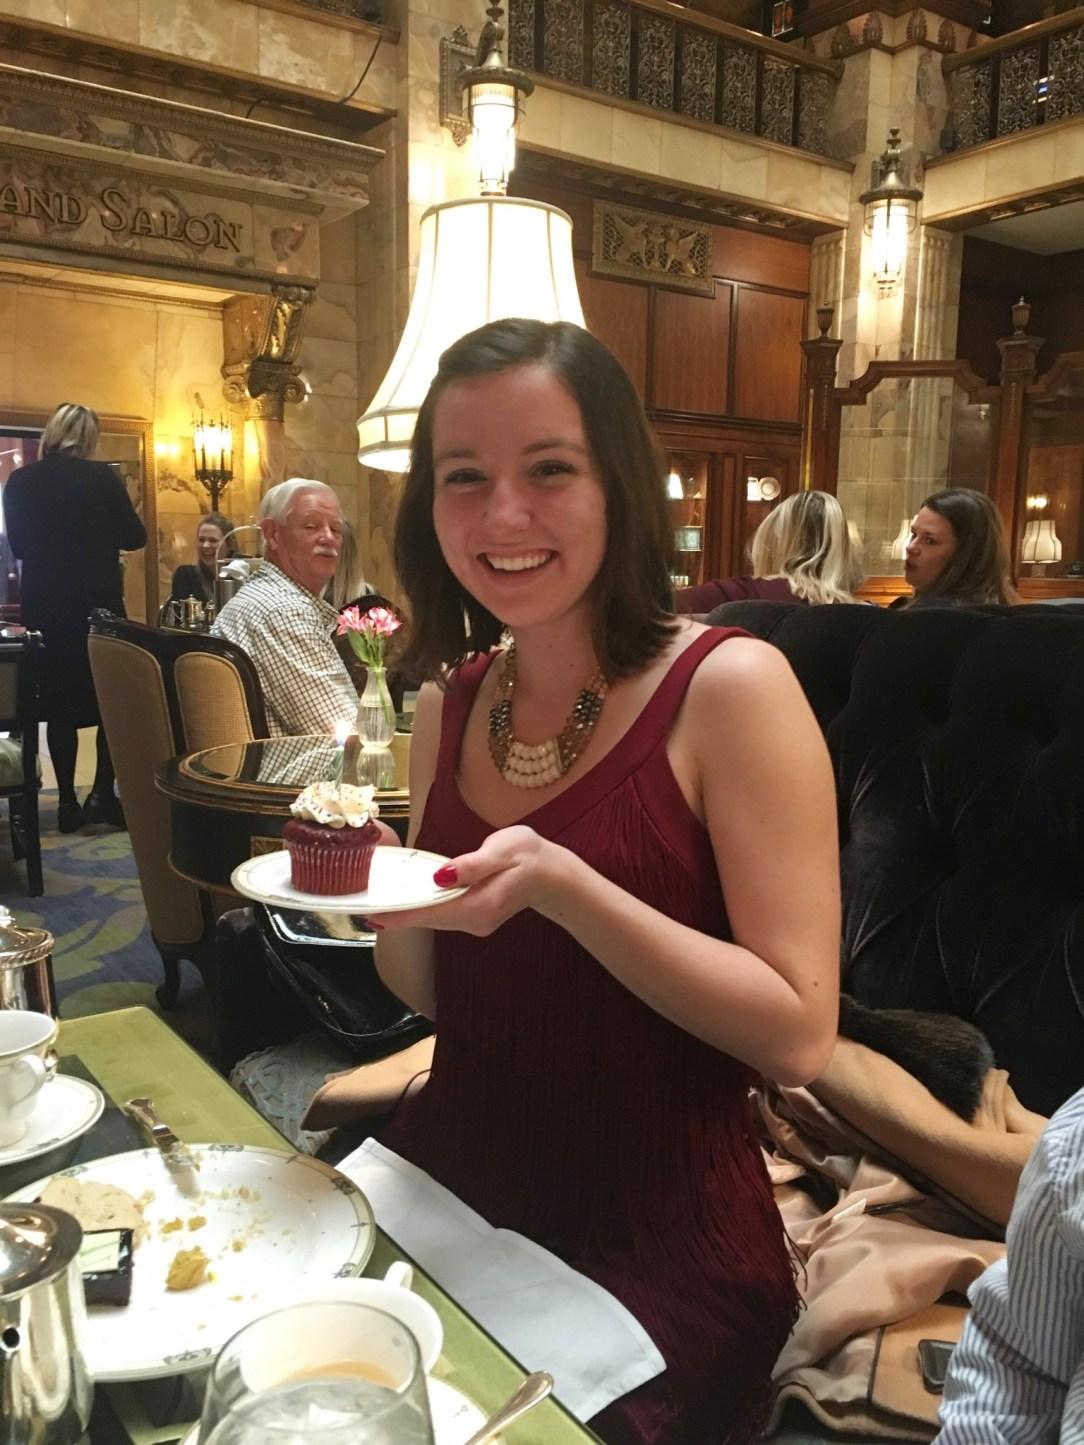 birthday cupcake statement necklace red dress